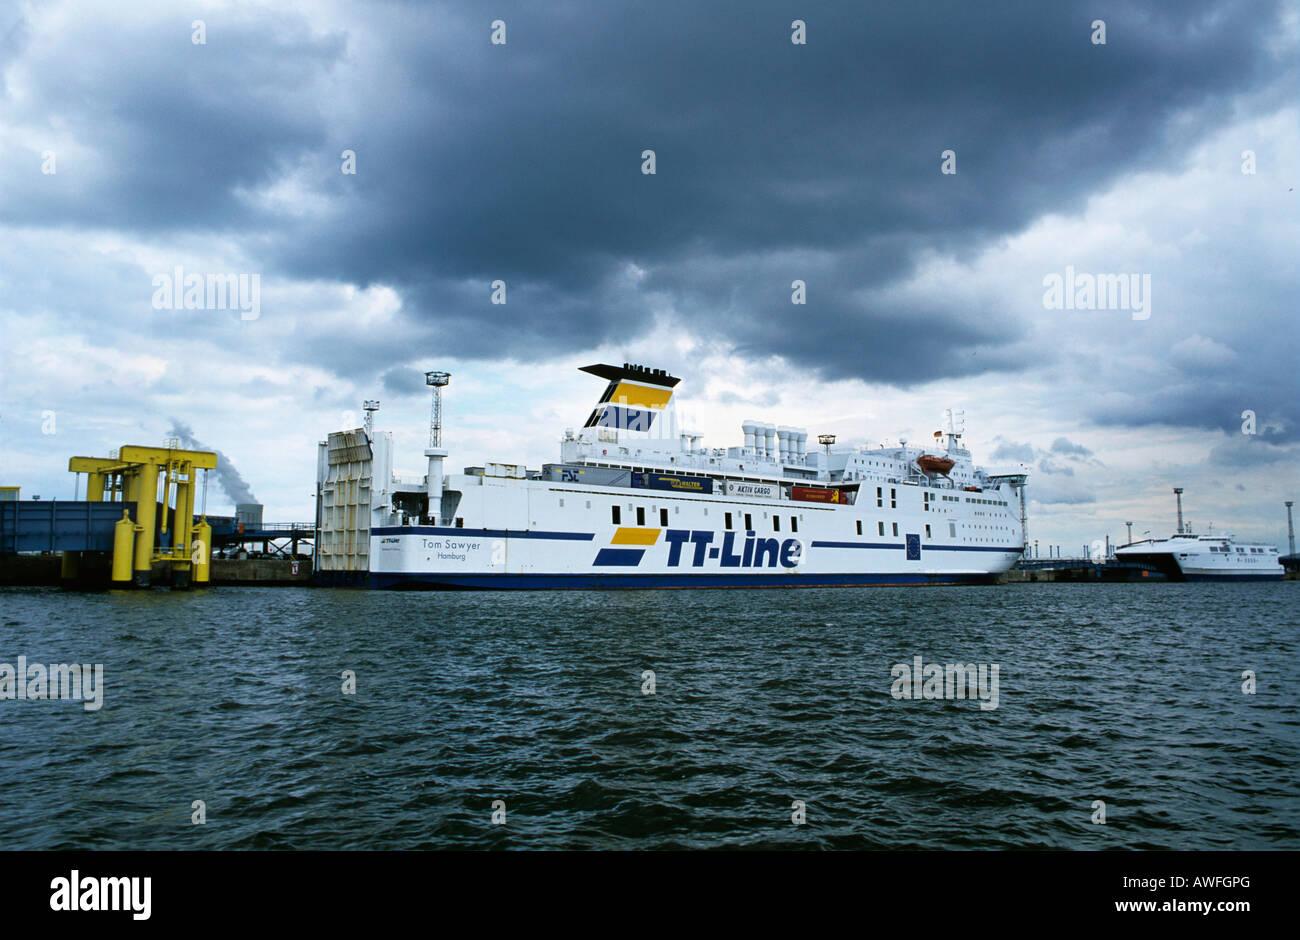 Car ferry on the Baltic Sea, Mecklenburg-Western Pomerania, Germany, Europe - Stock Image